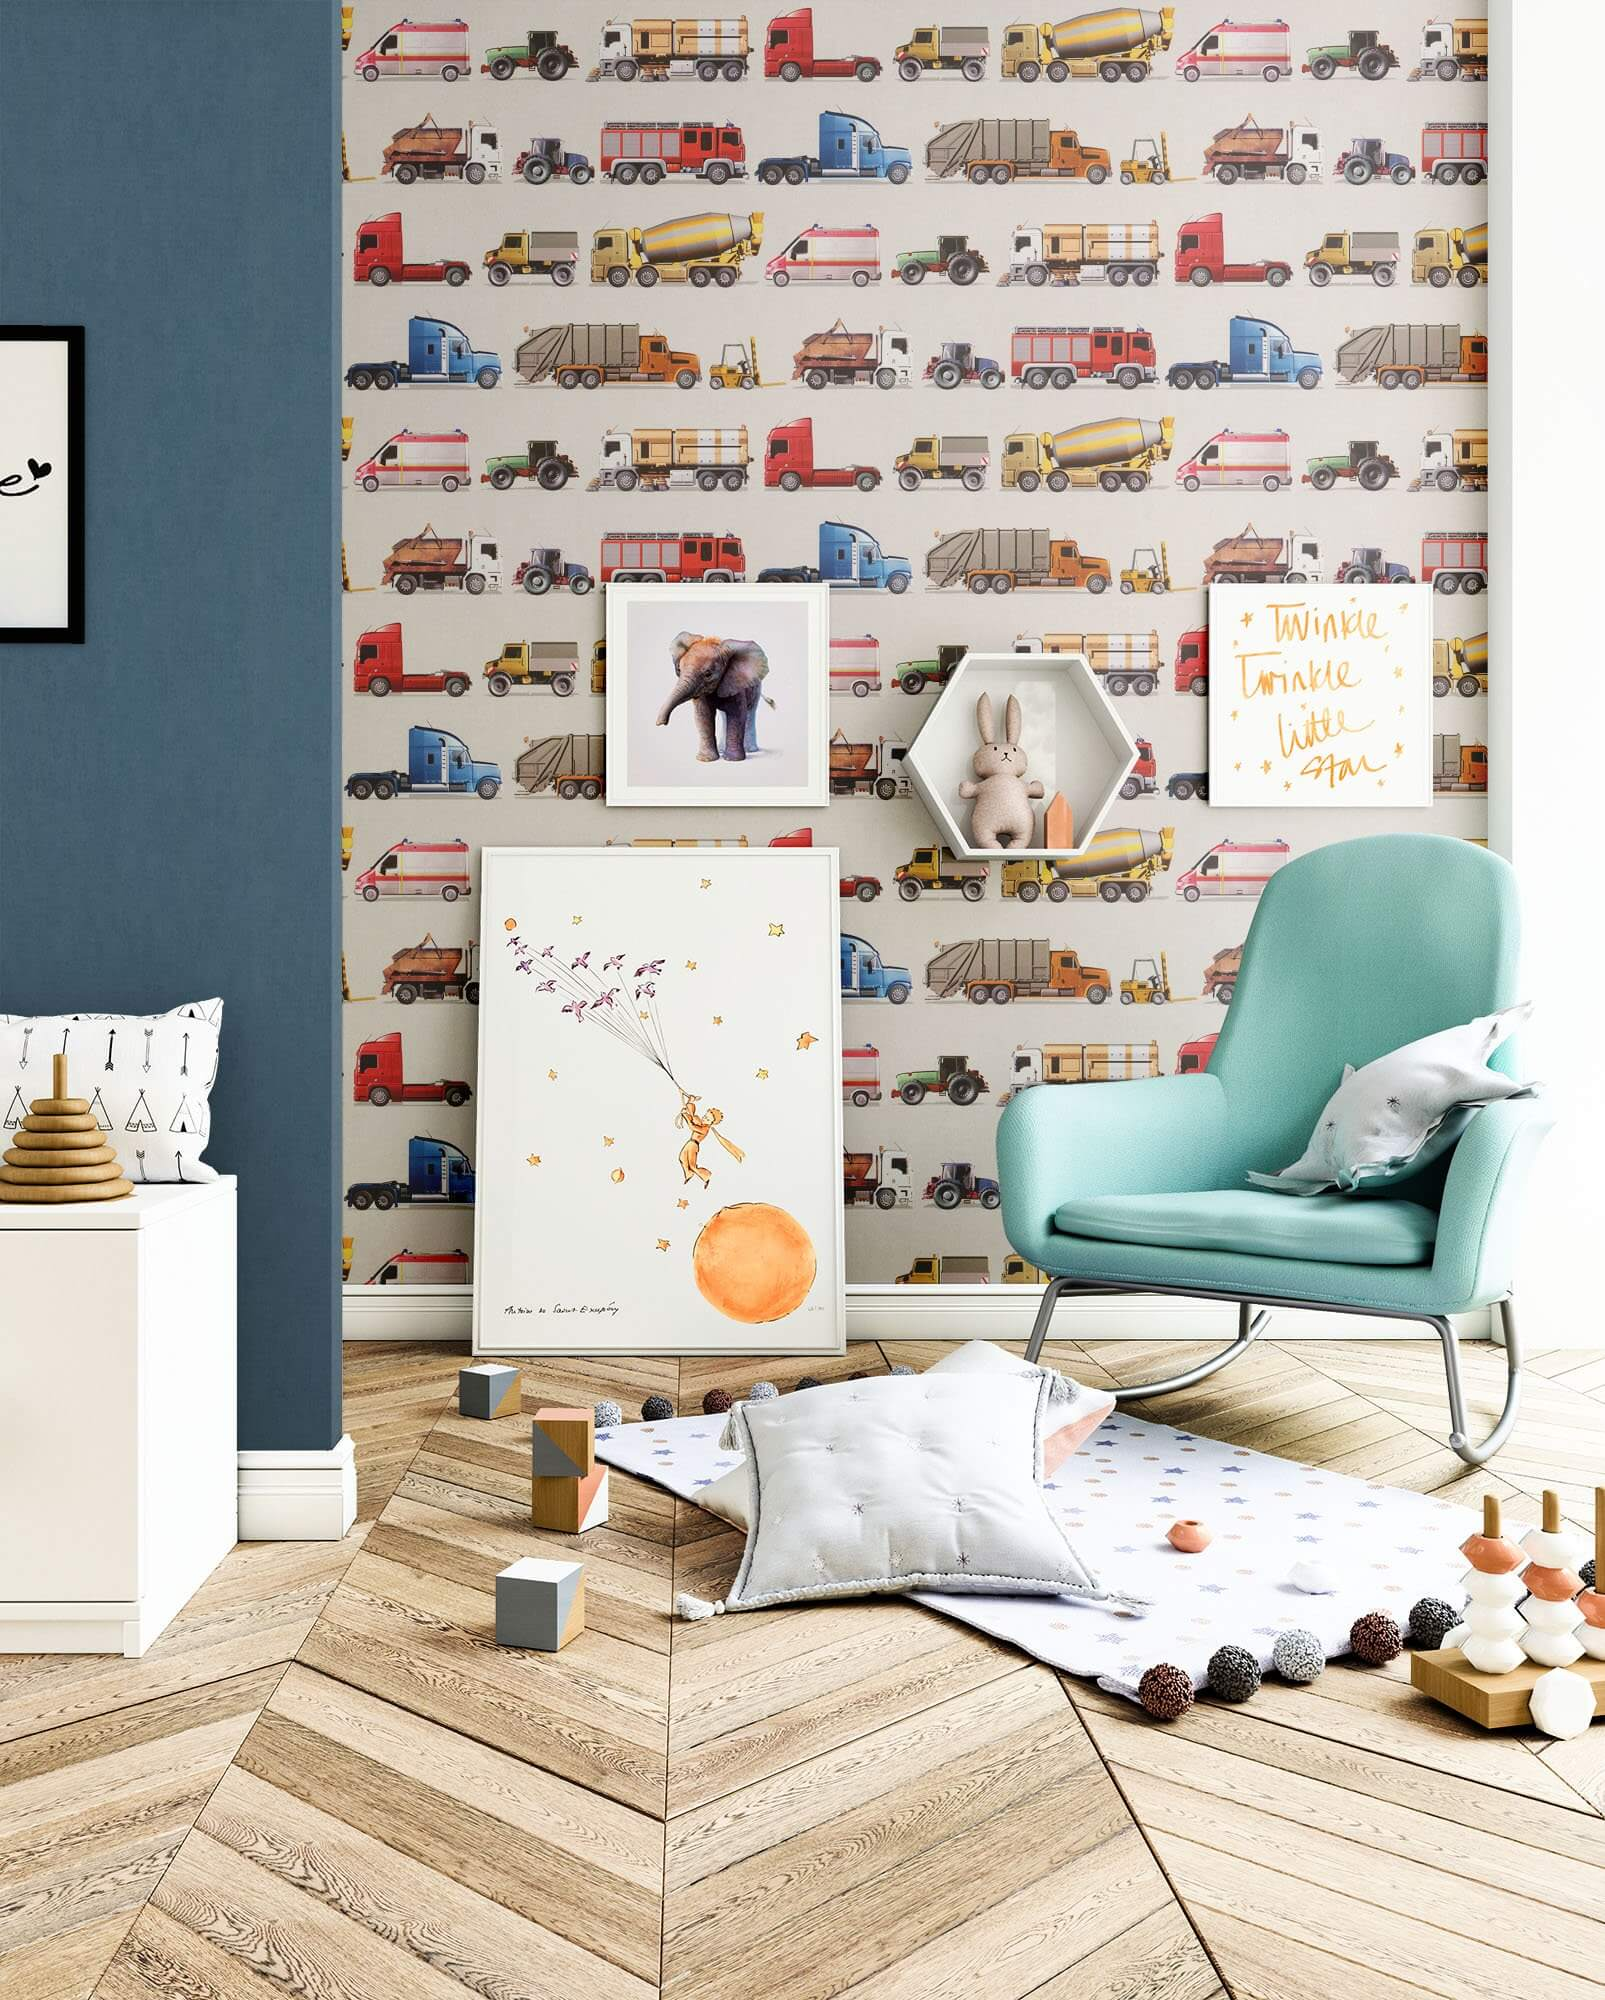 Papiertapete - Braun - Kinder - - Auto - Kinder - newroom